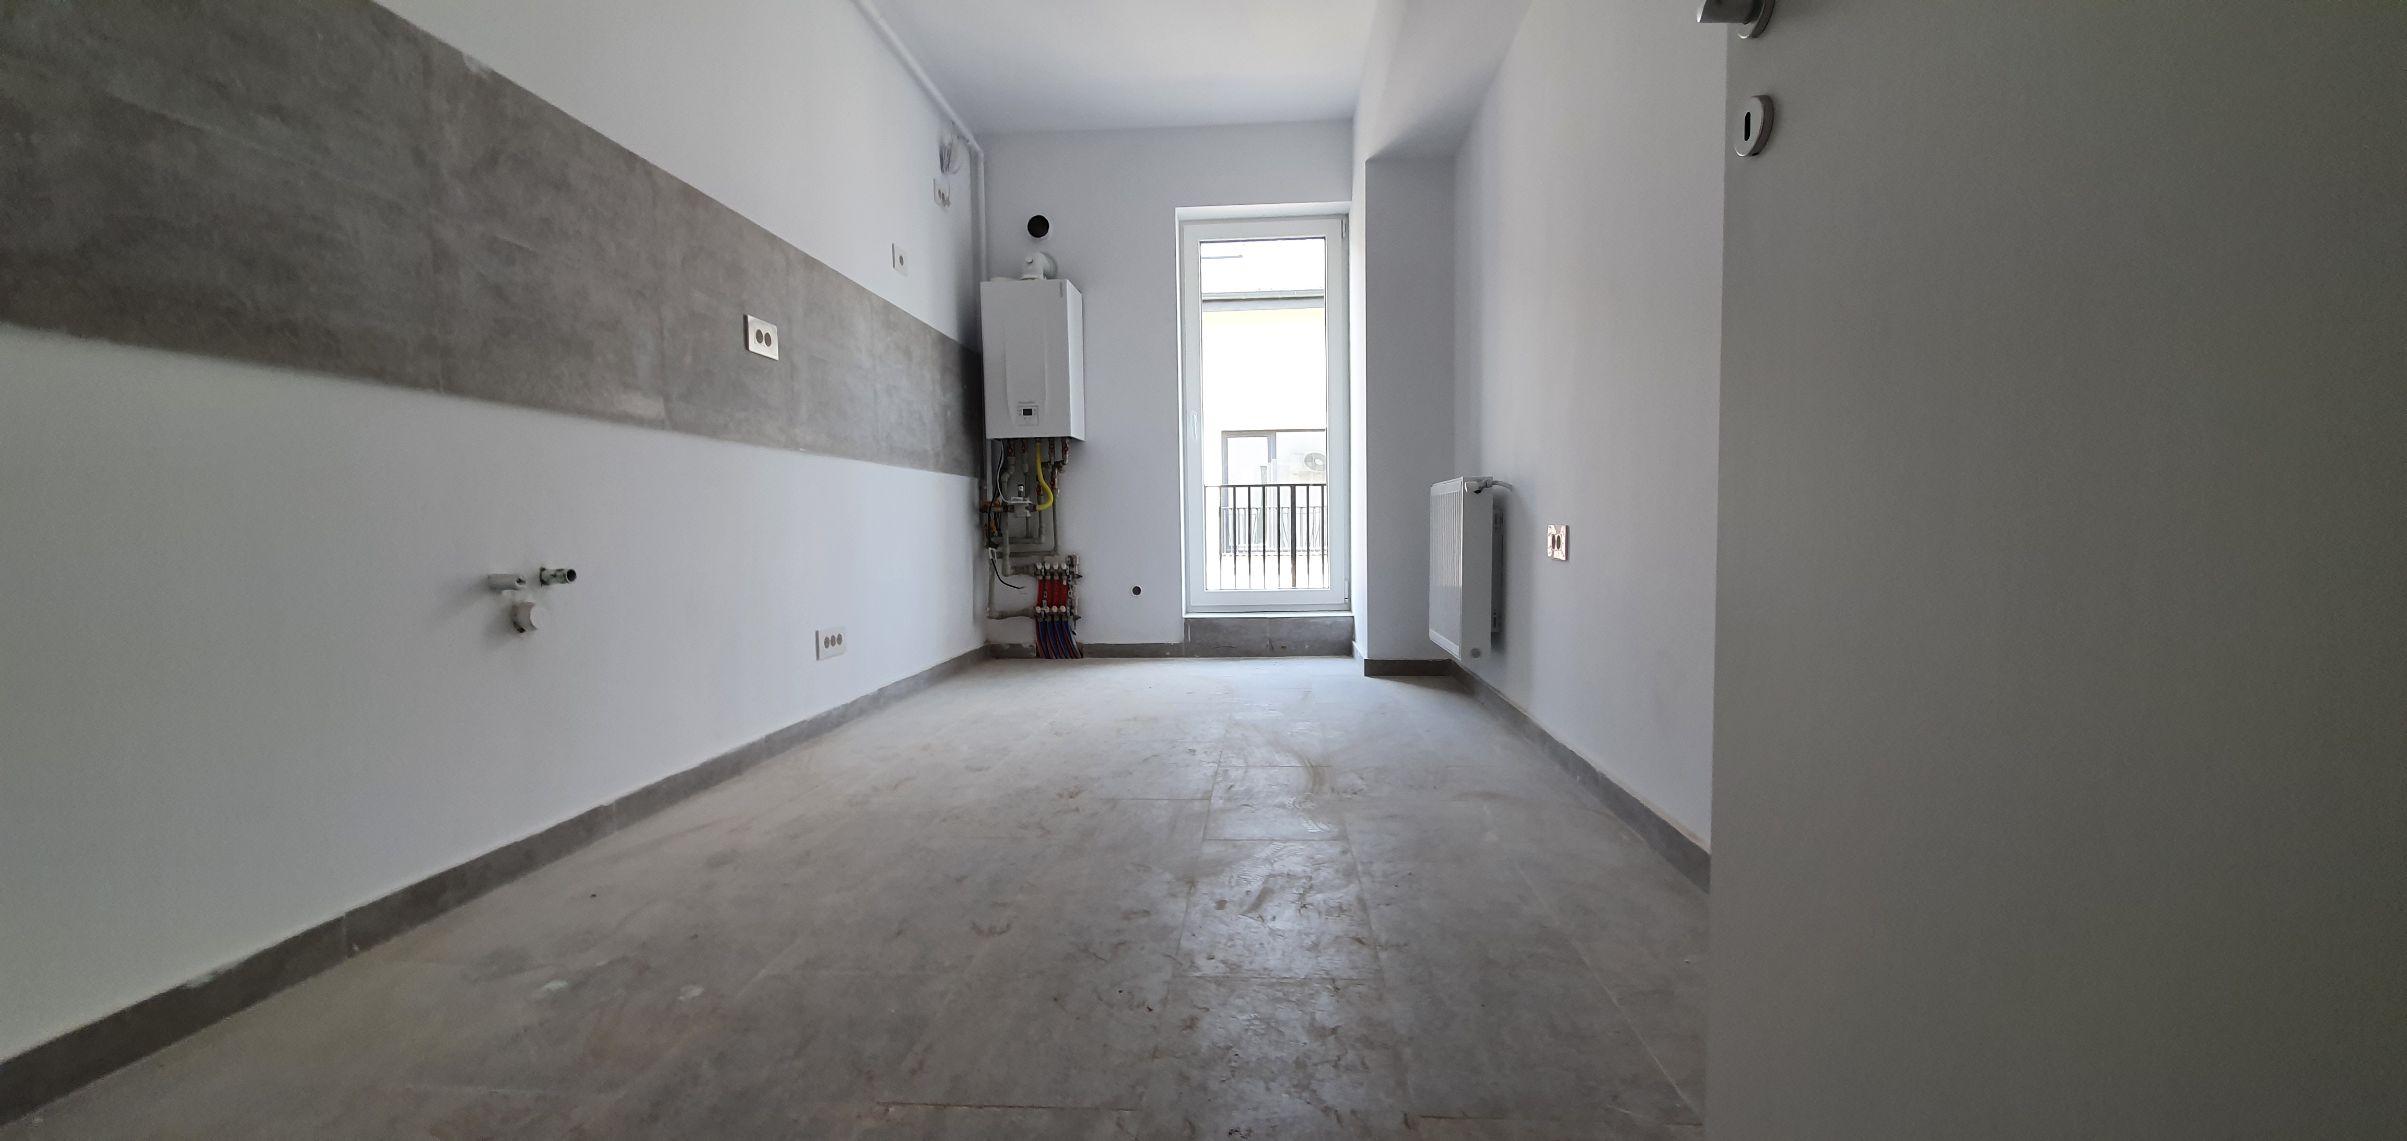 Bloc 2 - Etaj 2 - Apartament 15 - Bucatarie